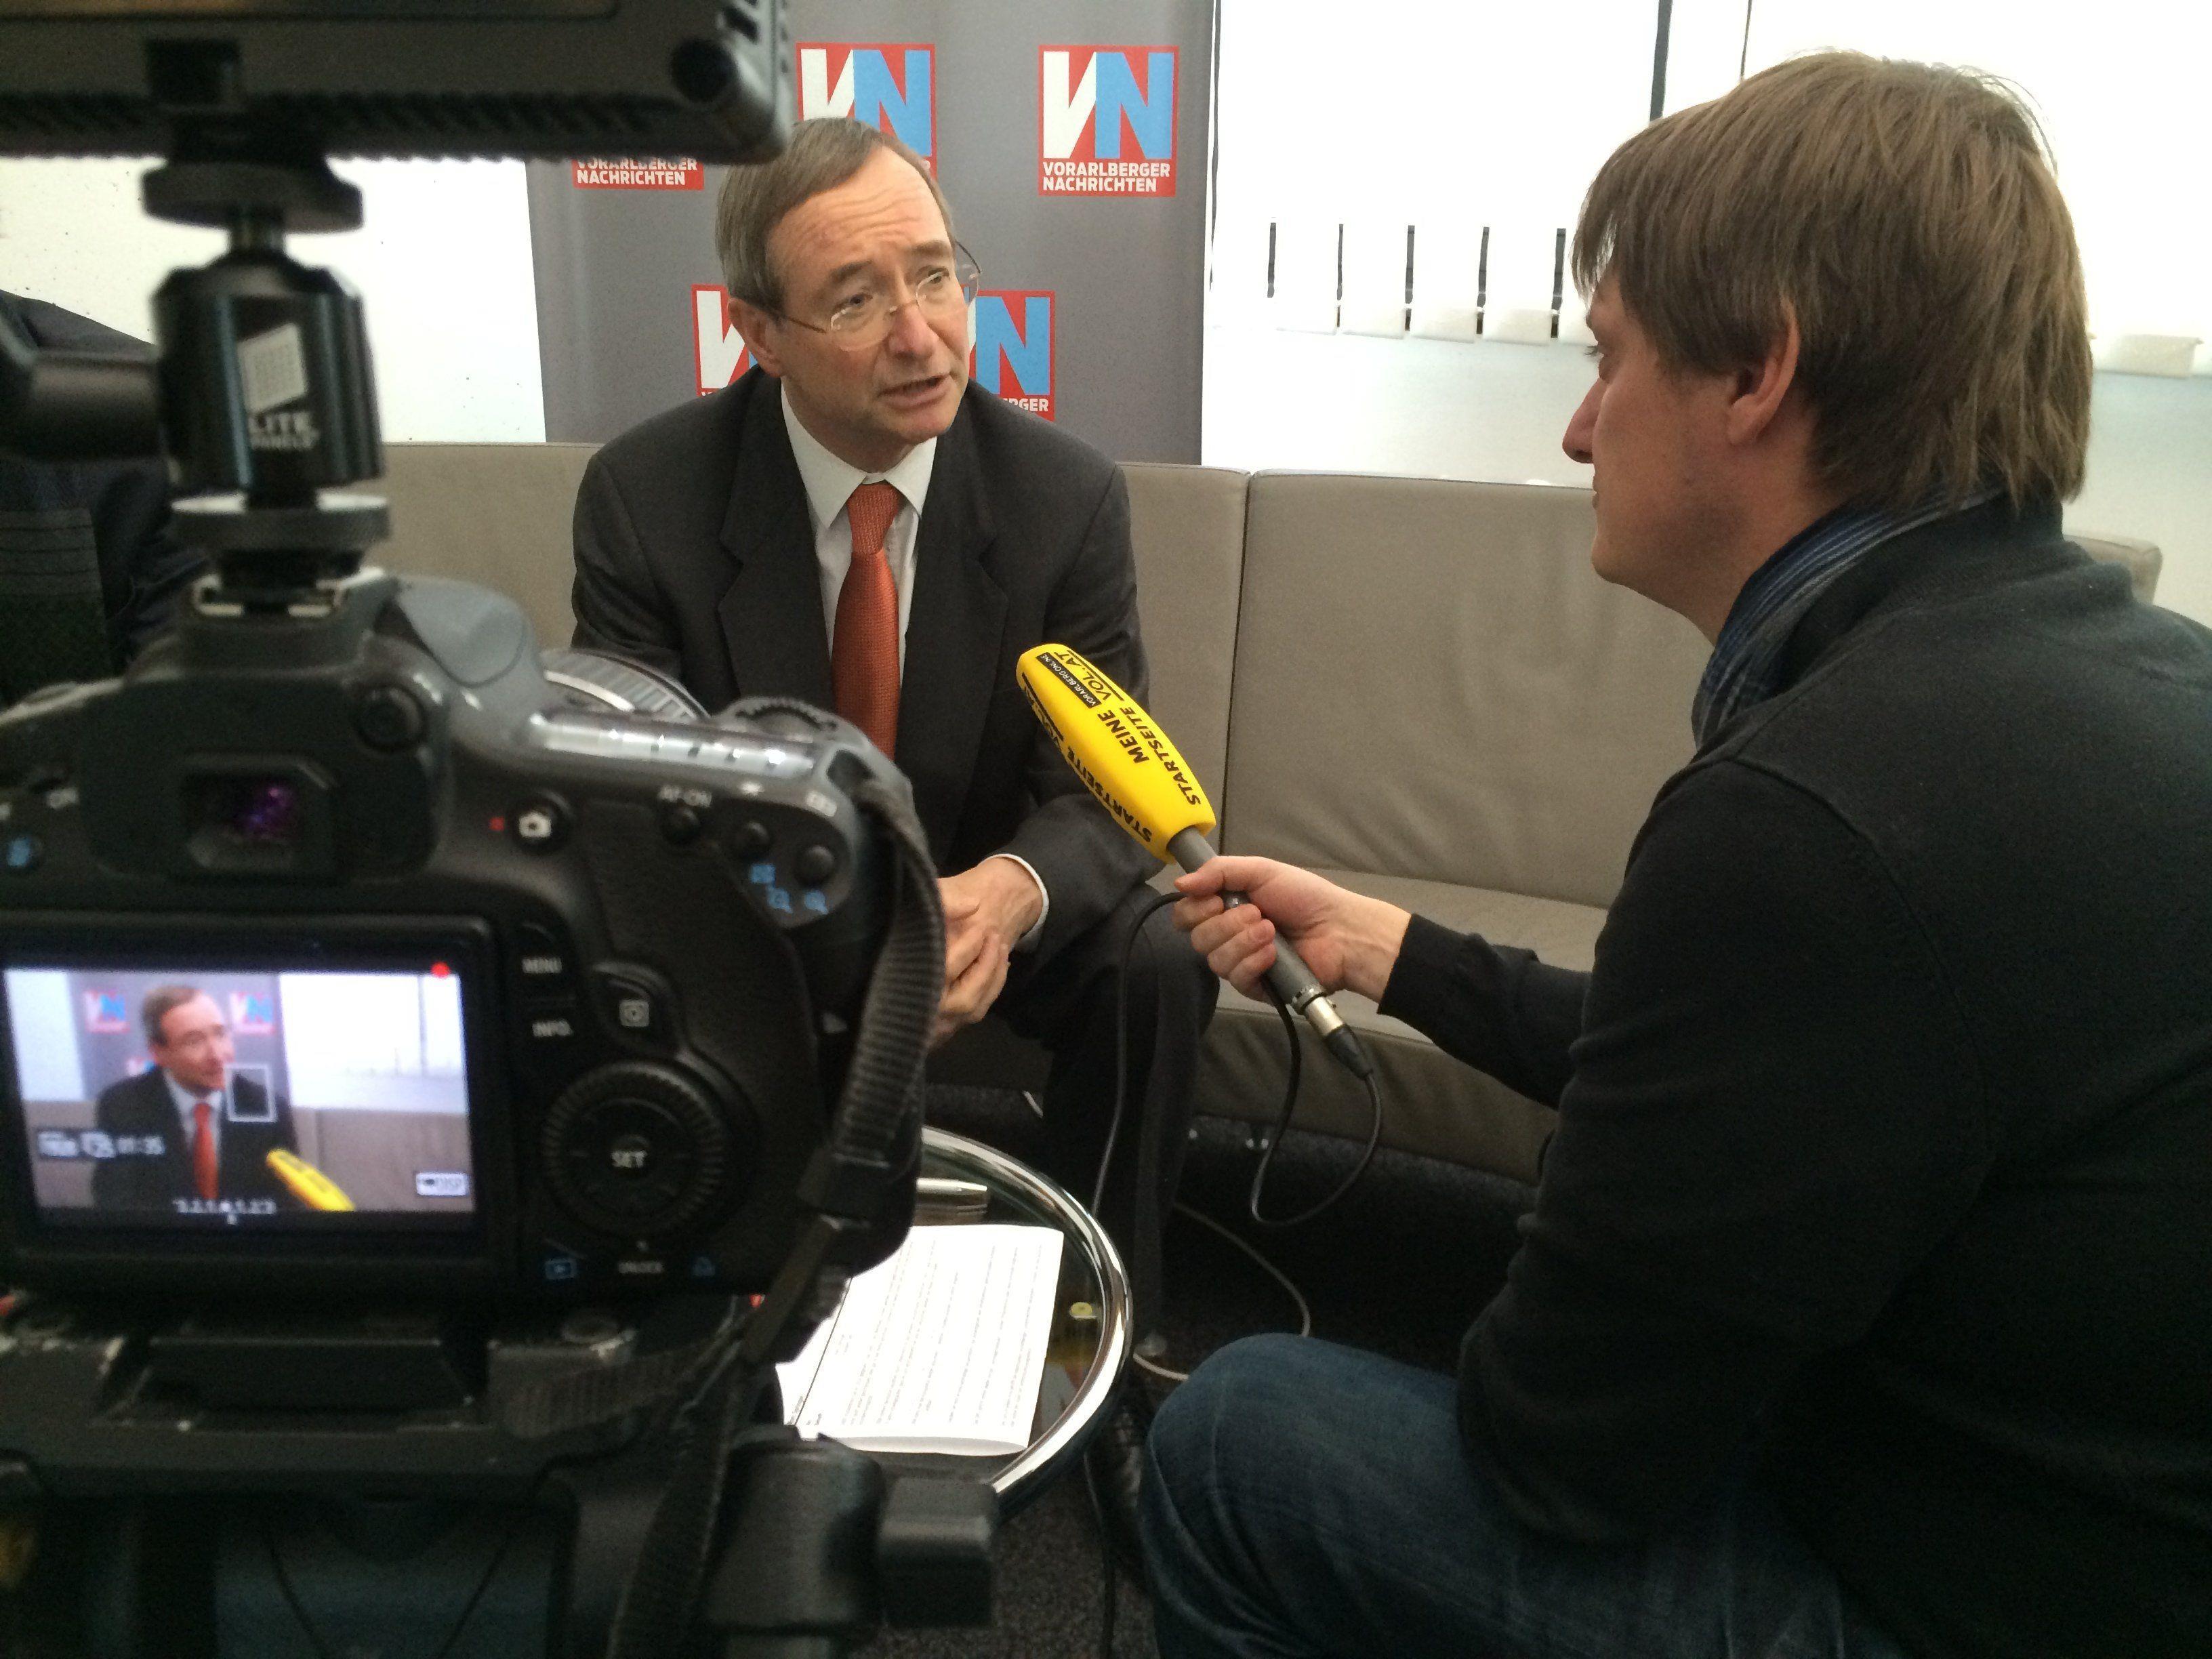 WKO-Präsident Christoph Leitl im VOL.AT-Interview mit CR Marc Springer.